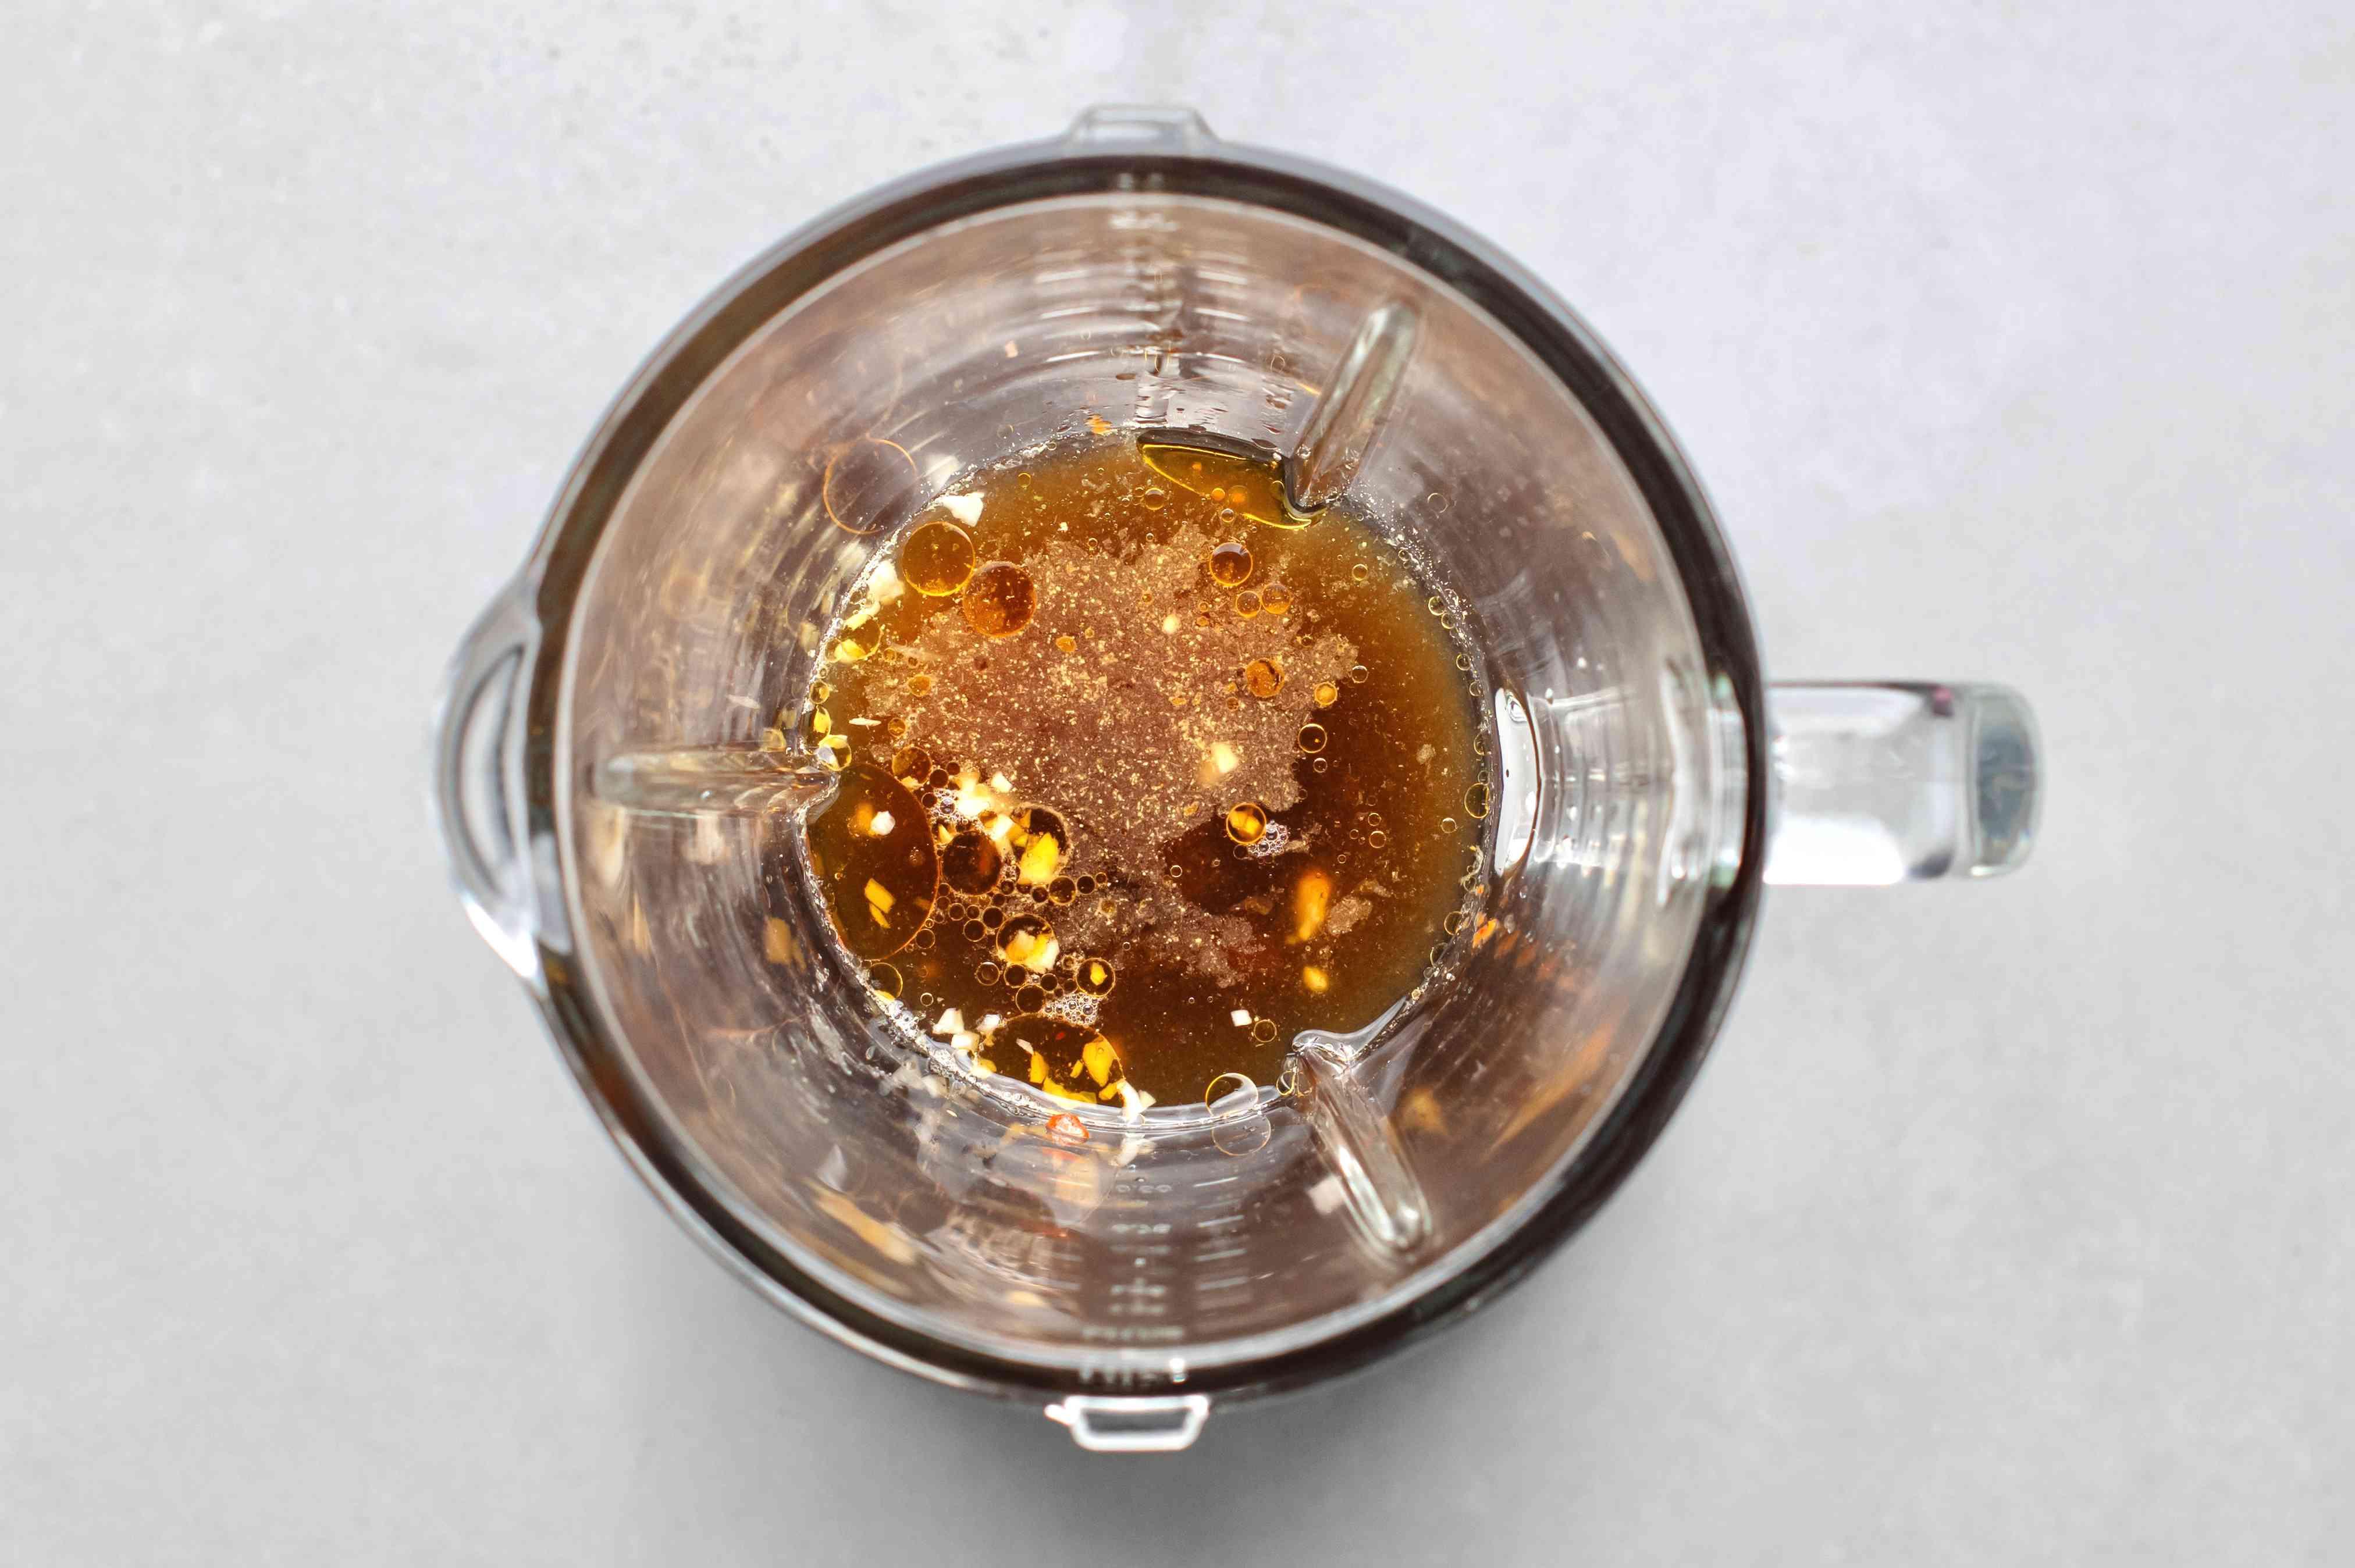 vegetable broth, rice vinegar, soy sauce, sesame oil, sugar, garlic, ginger, chili paste and lime in a blender